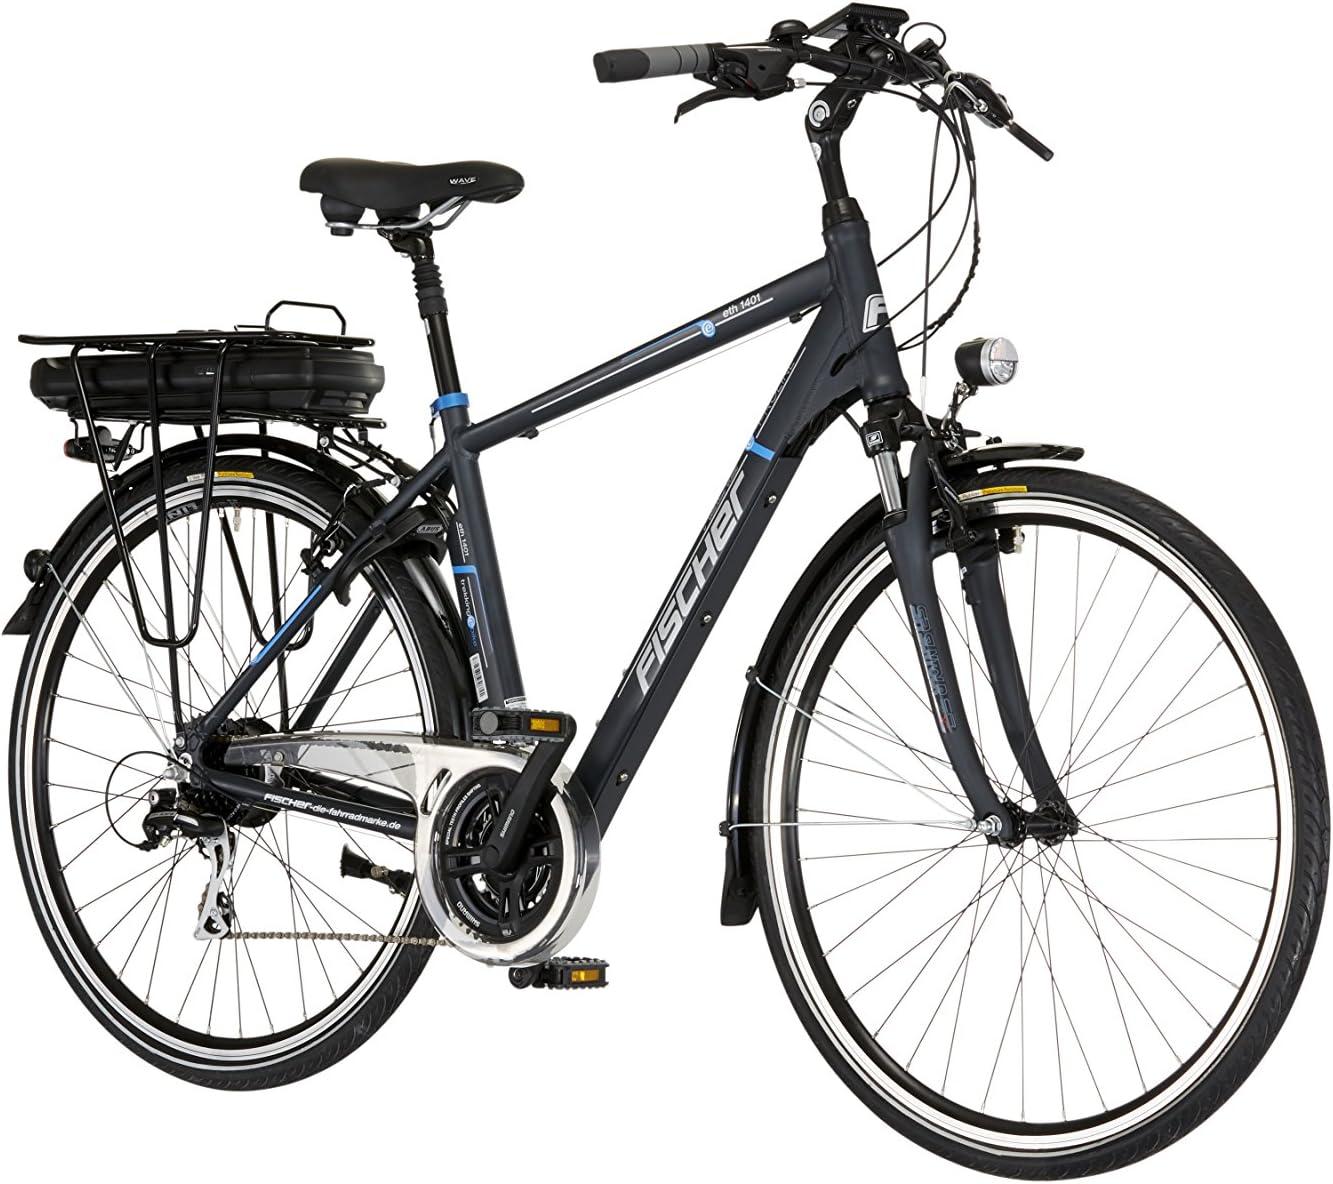 Fischer Proline ETH 1401 19143 - Bicicleta eléctrica para hombre ...